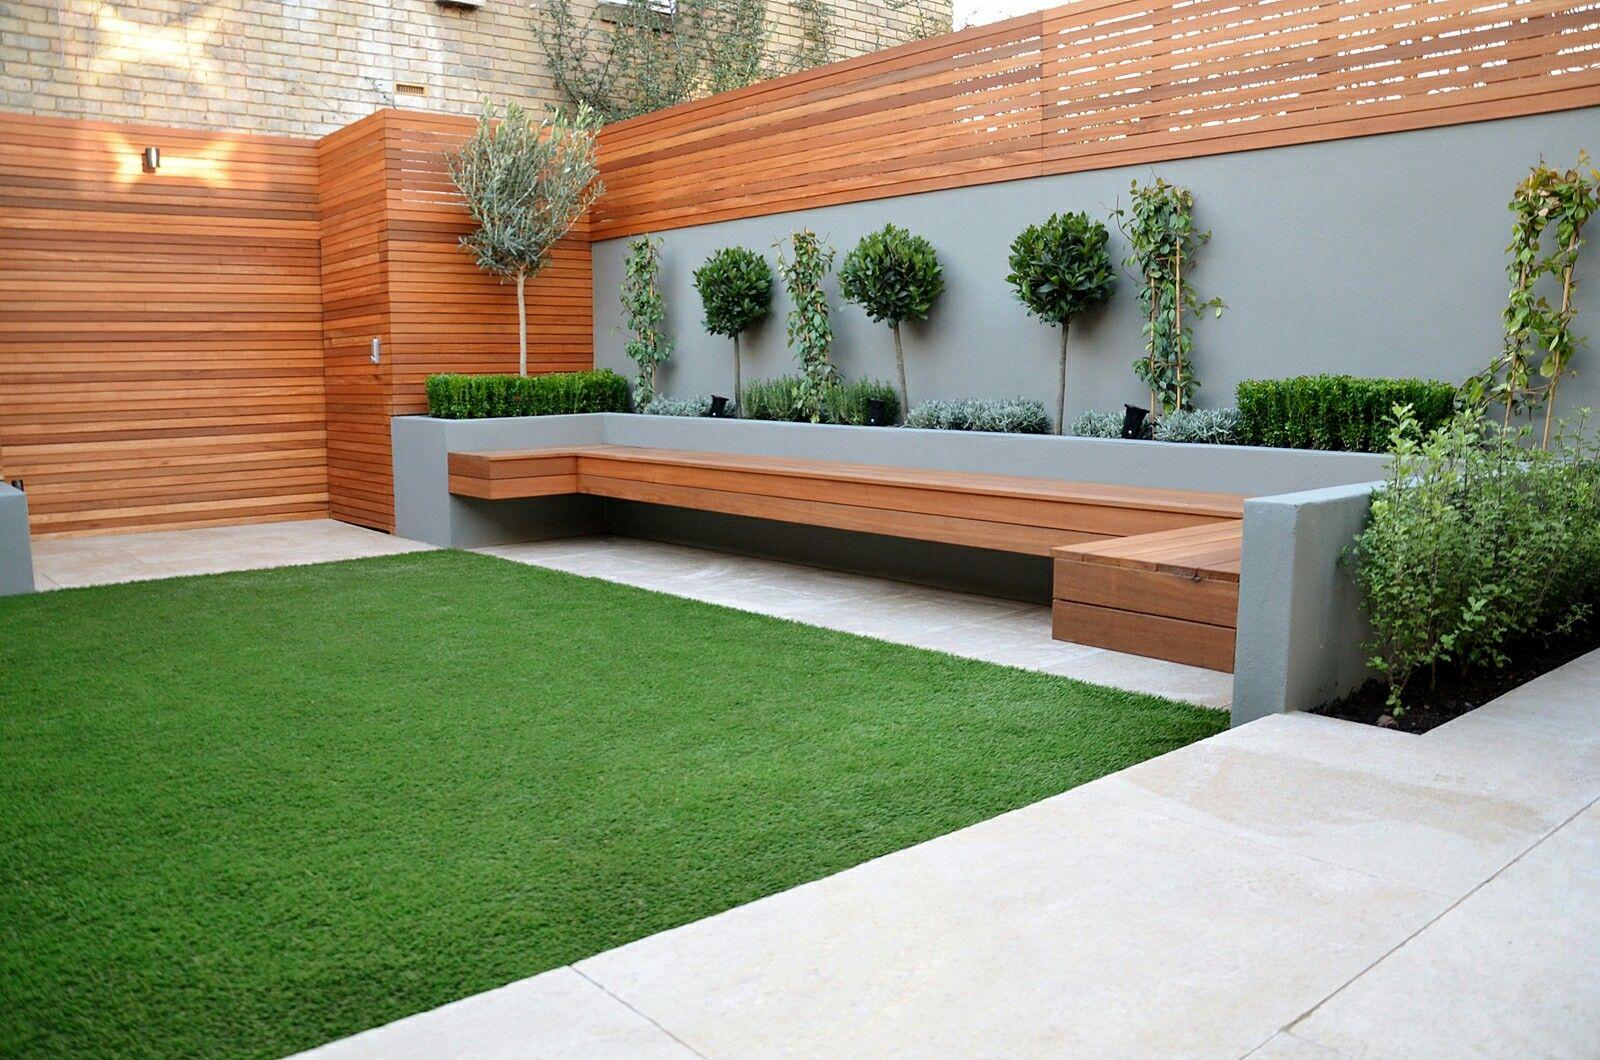 Pin by Shelley Tarlow on backyard ideas | Low maintenance ...